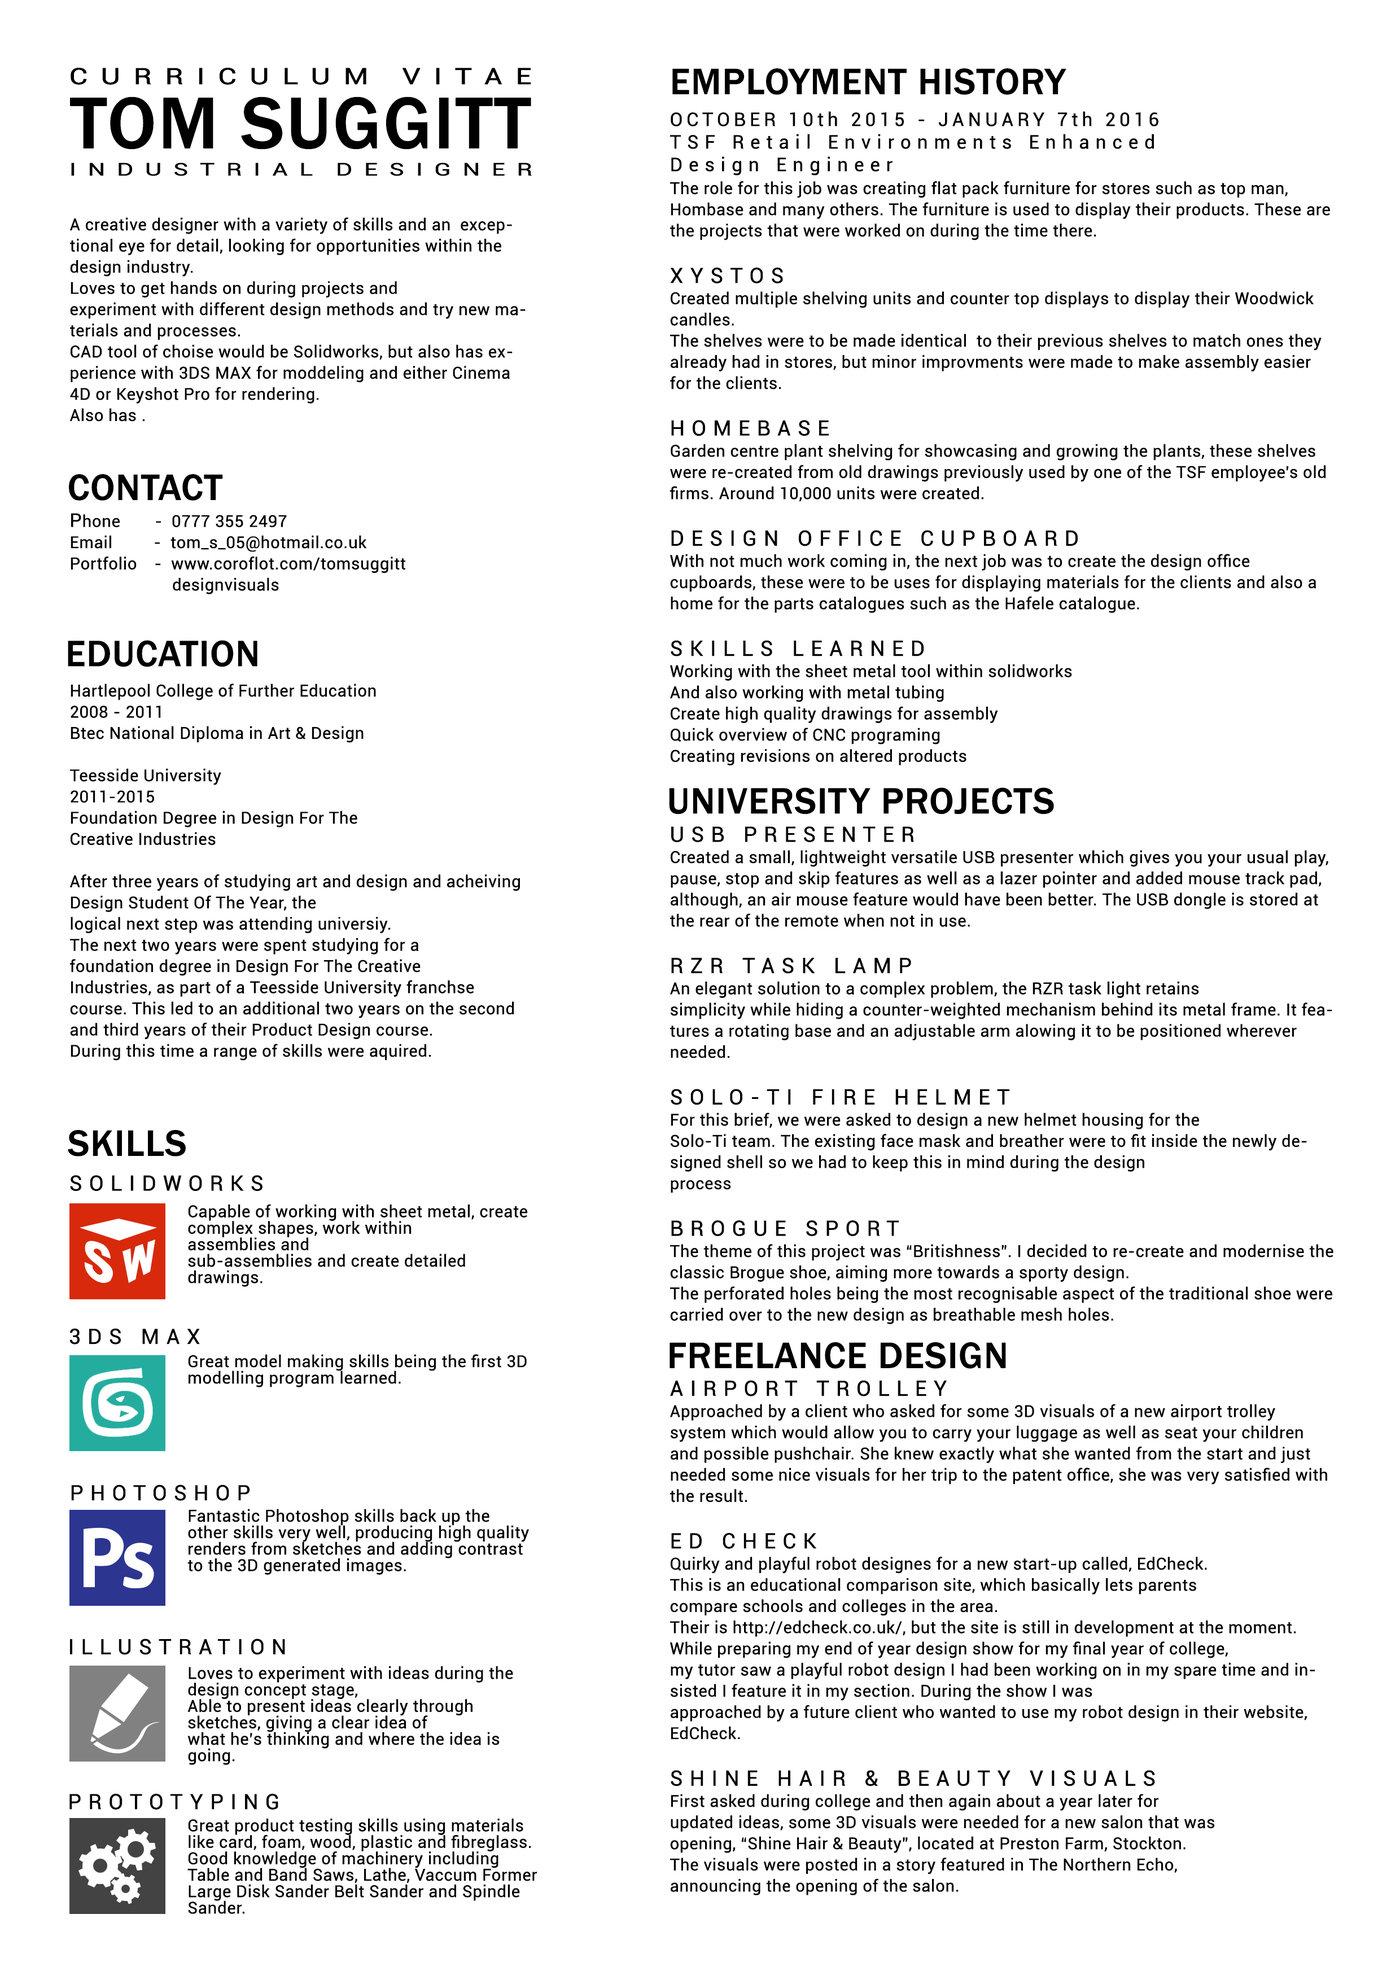 My CV by Tom Suggitt at Coroflot com